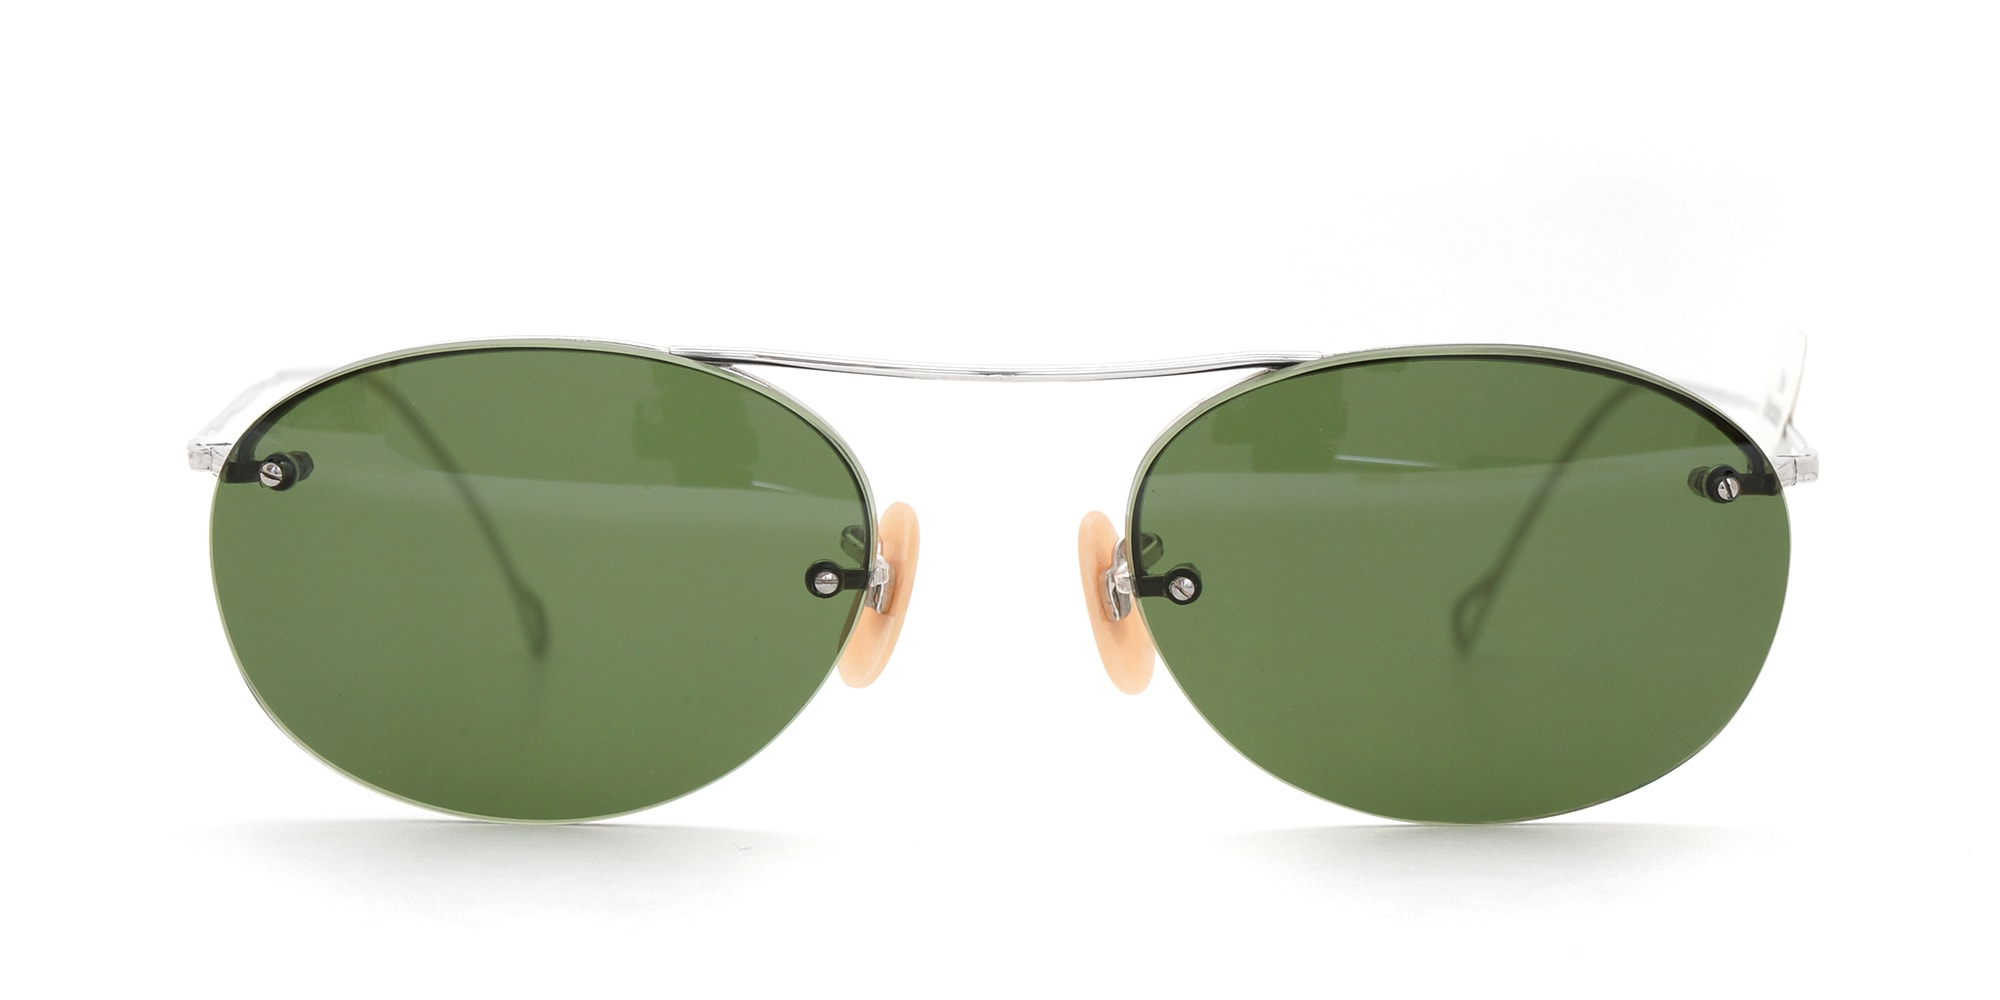 The Spectacle サングラス 1938-1950s SHURON Mid-Century-Modern-Bar 1/10 12KGF 44/20 イメージ3